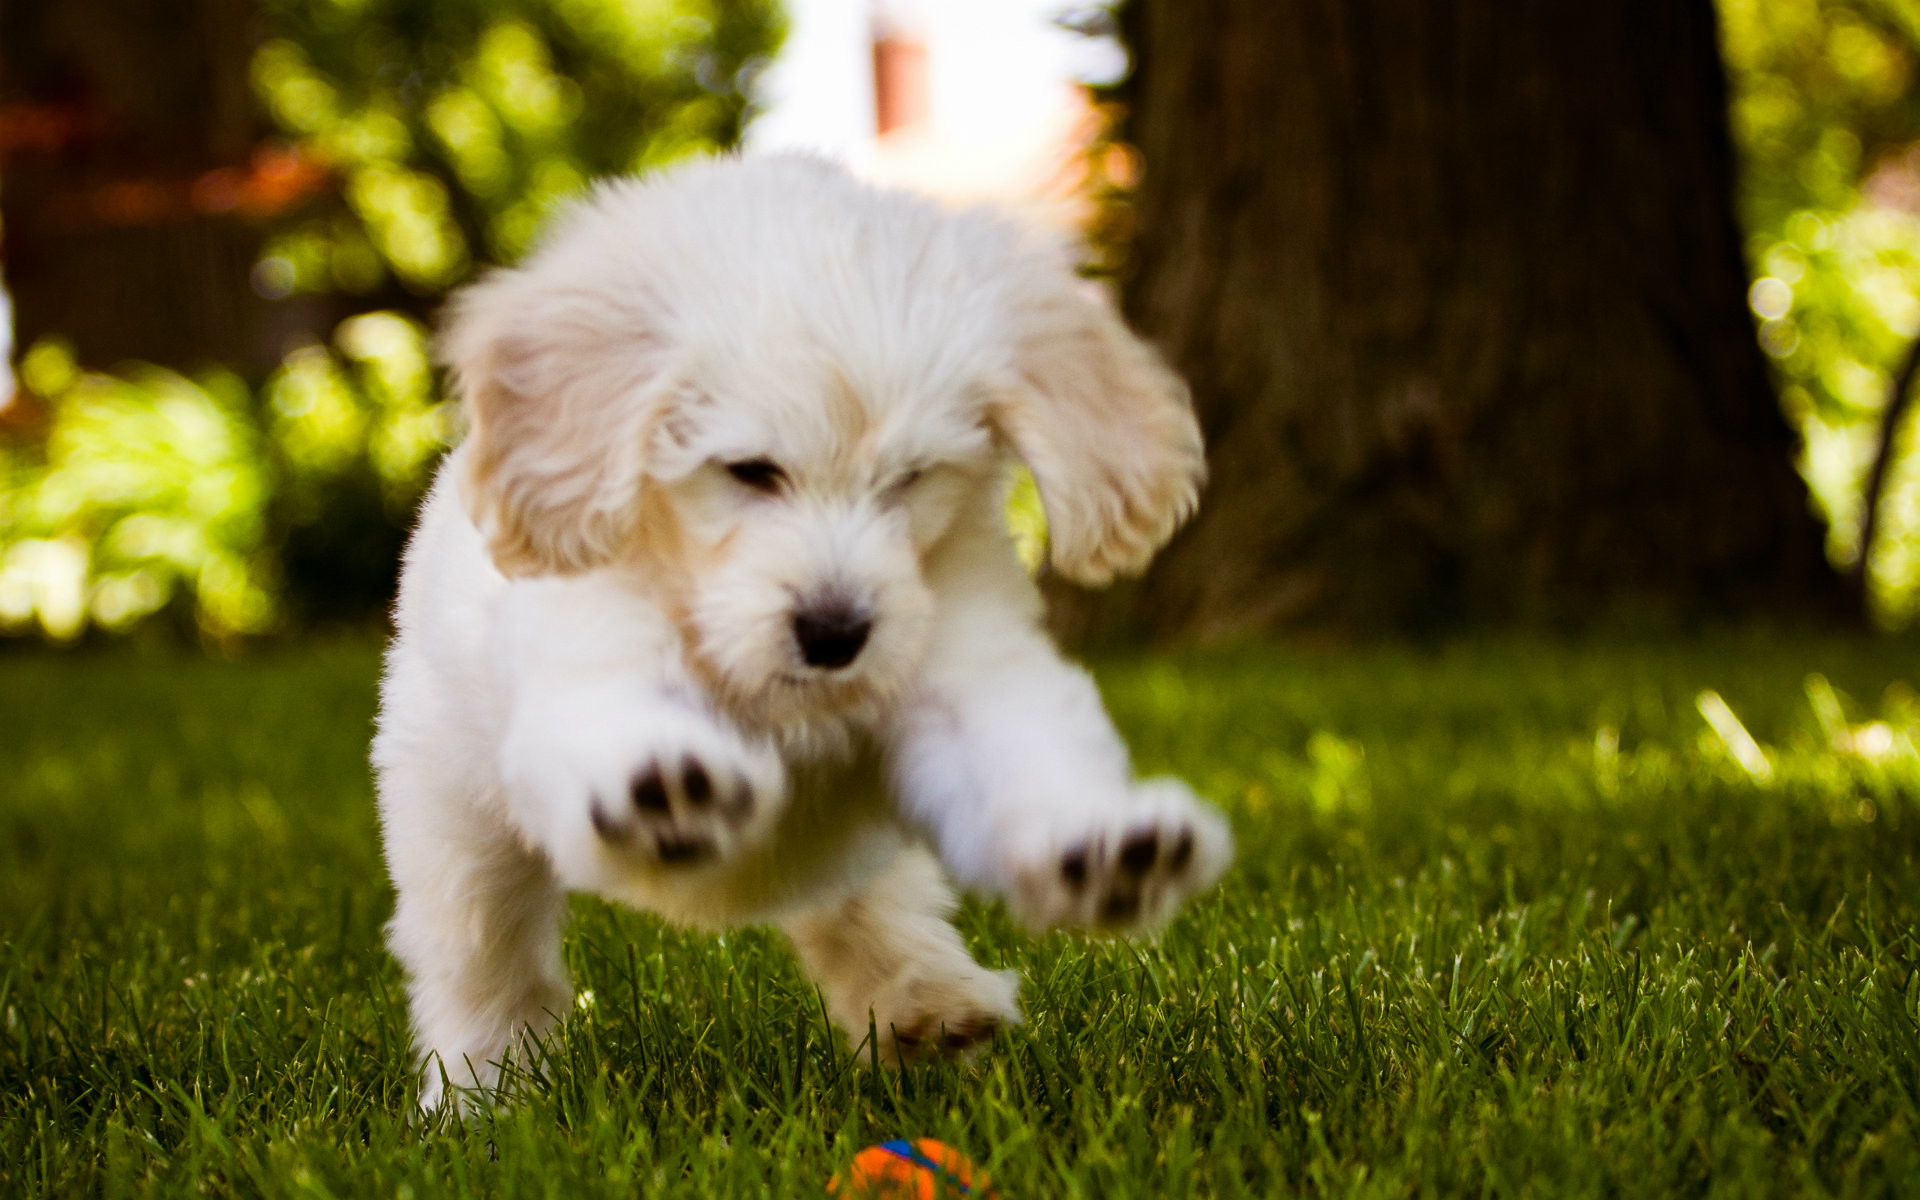 cute puppy wallpaper free download